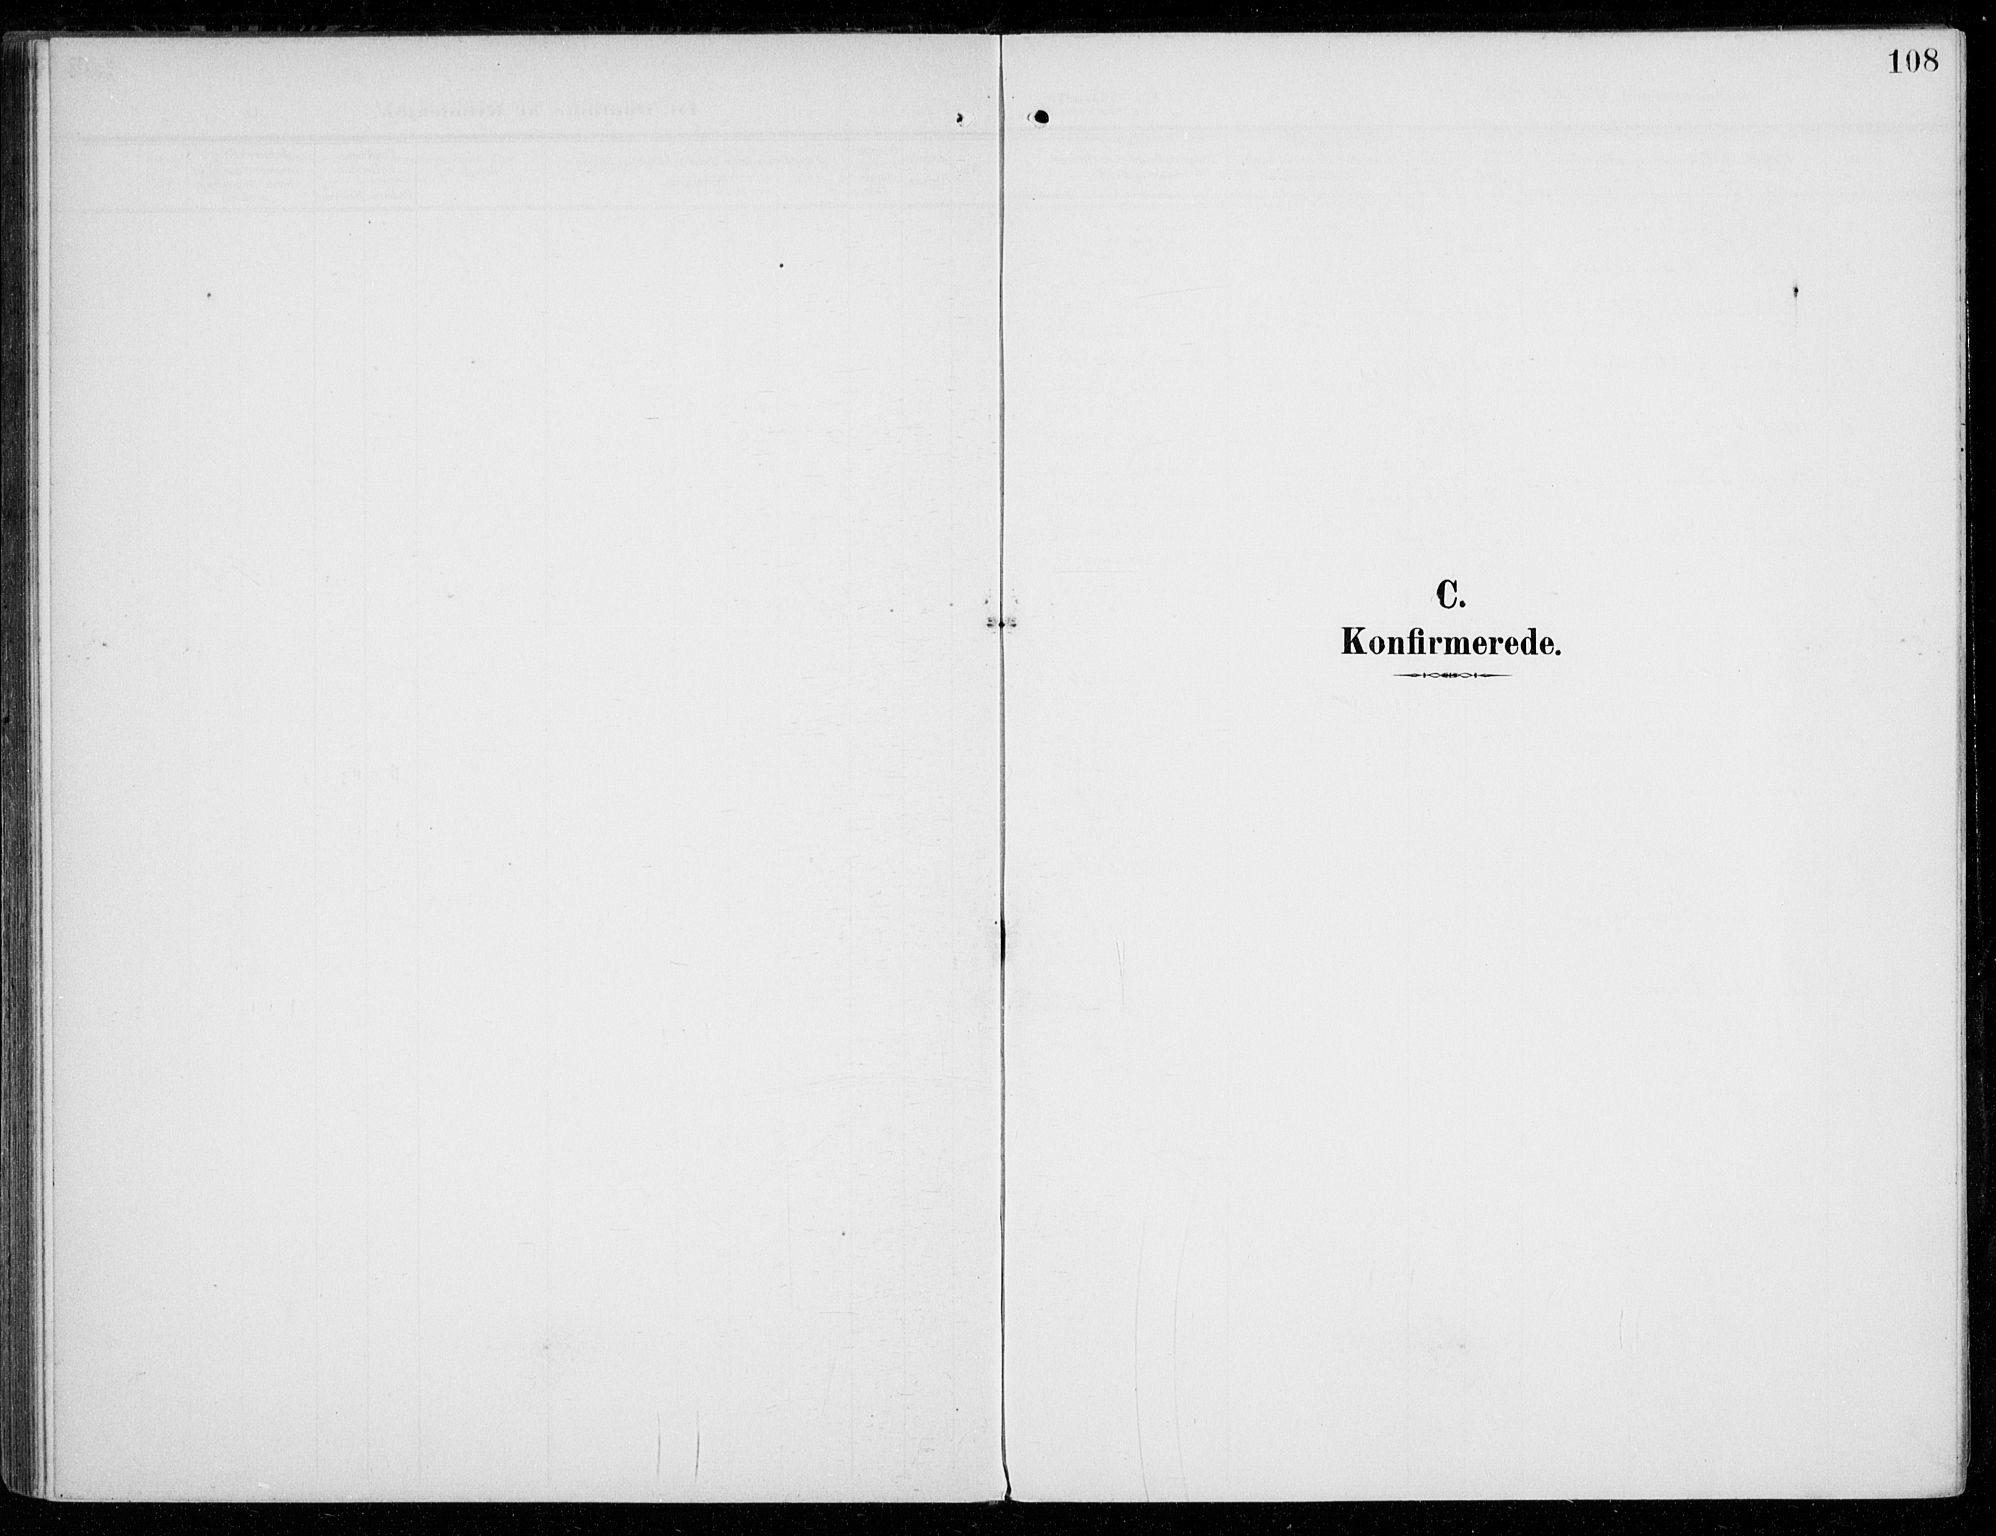 SAO, Vestby prestekontor Kirkebøker, F/Fc/L0002: Ministerialbok nr. III 2, 1906-1940, s. 108